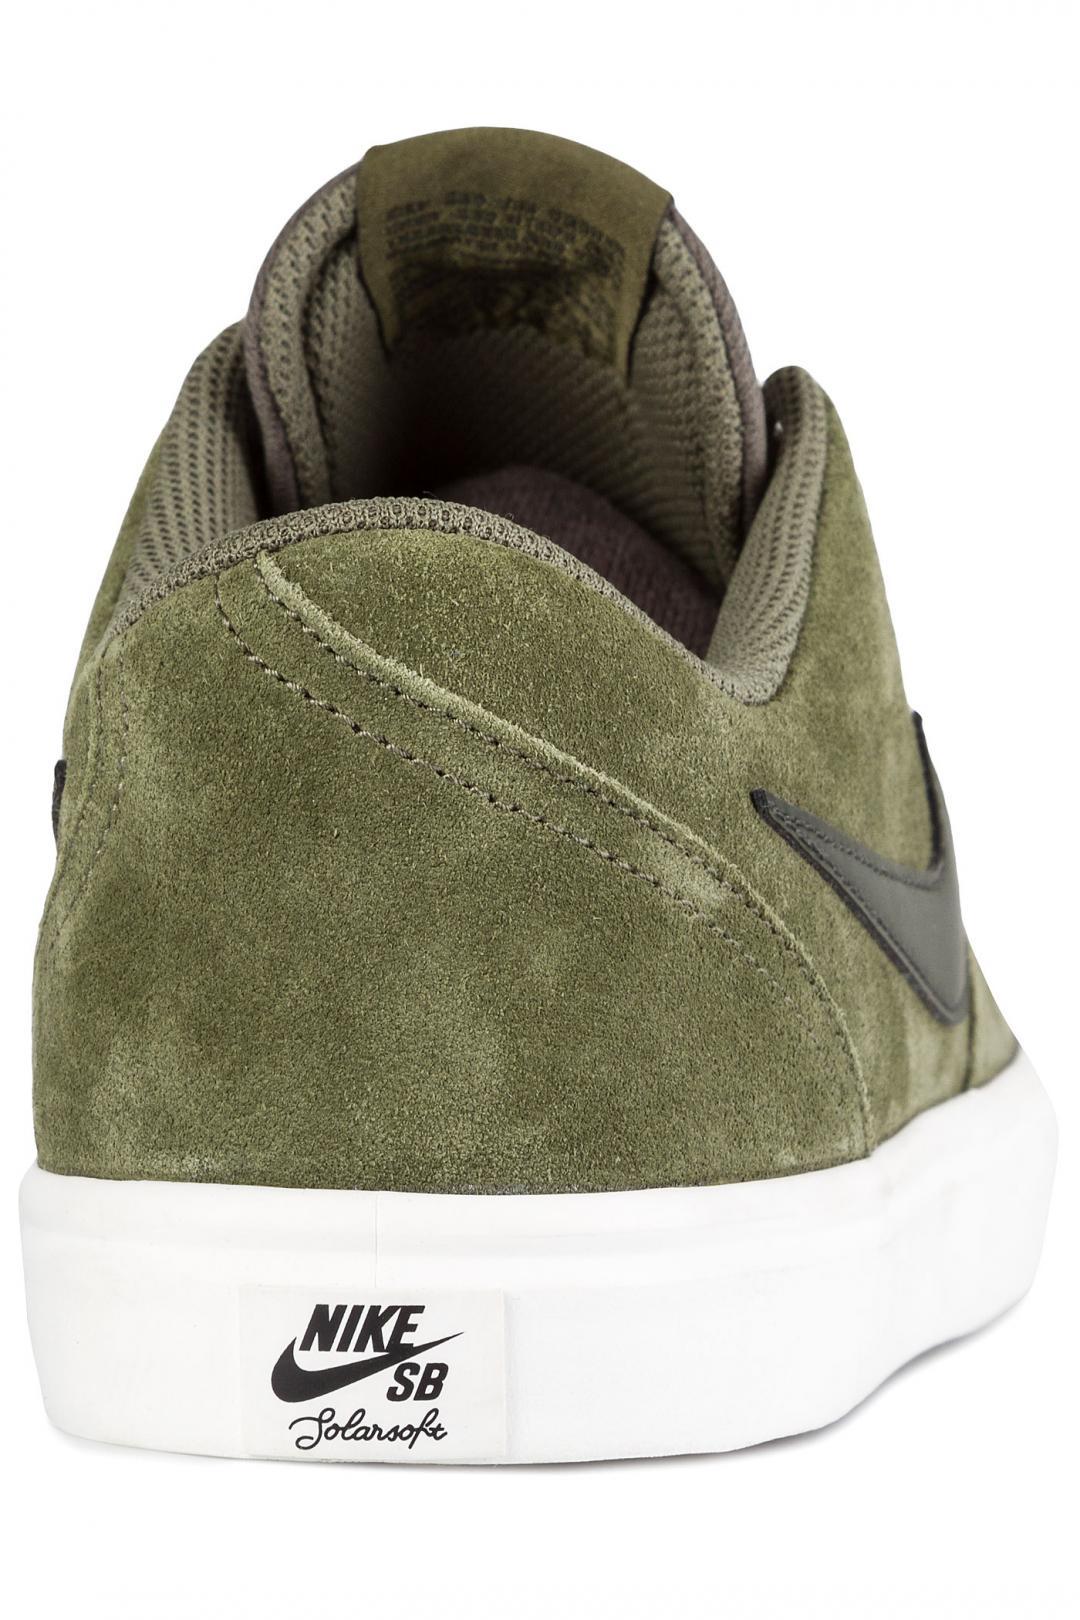 Uomo Nike SB Check Solarsoft medium olive sequoia   Sneakers low top